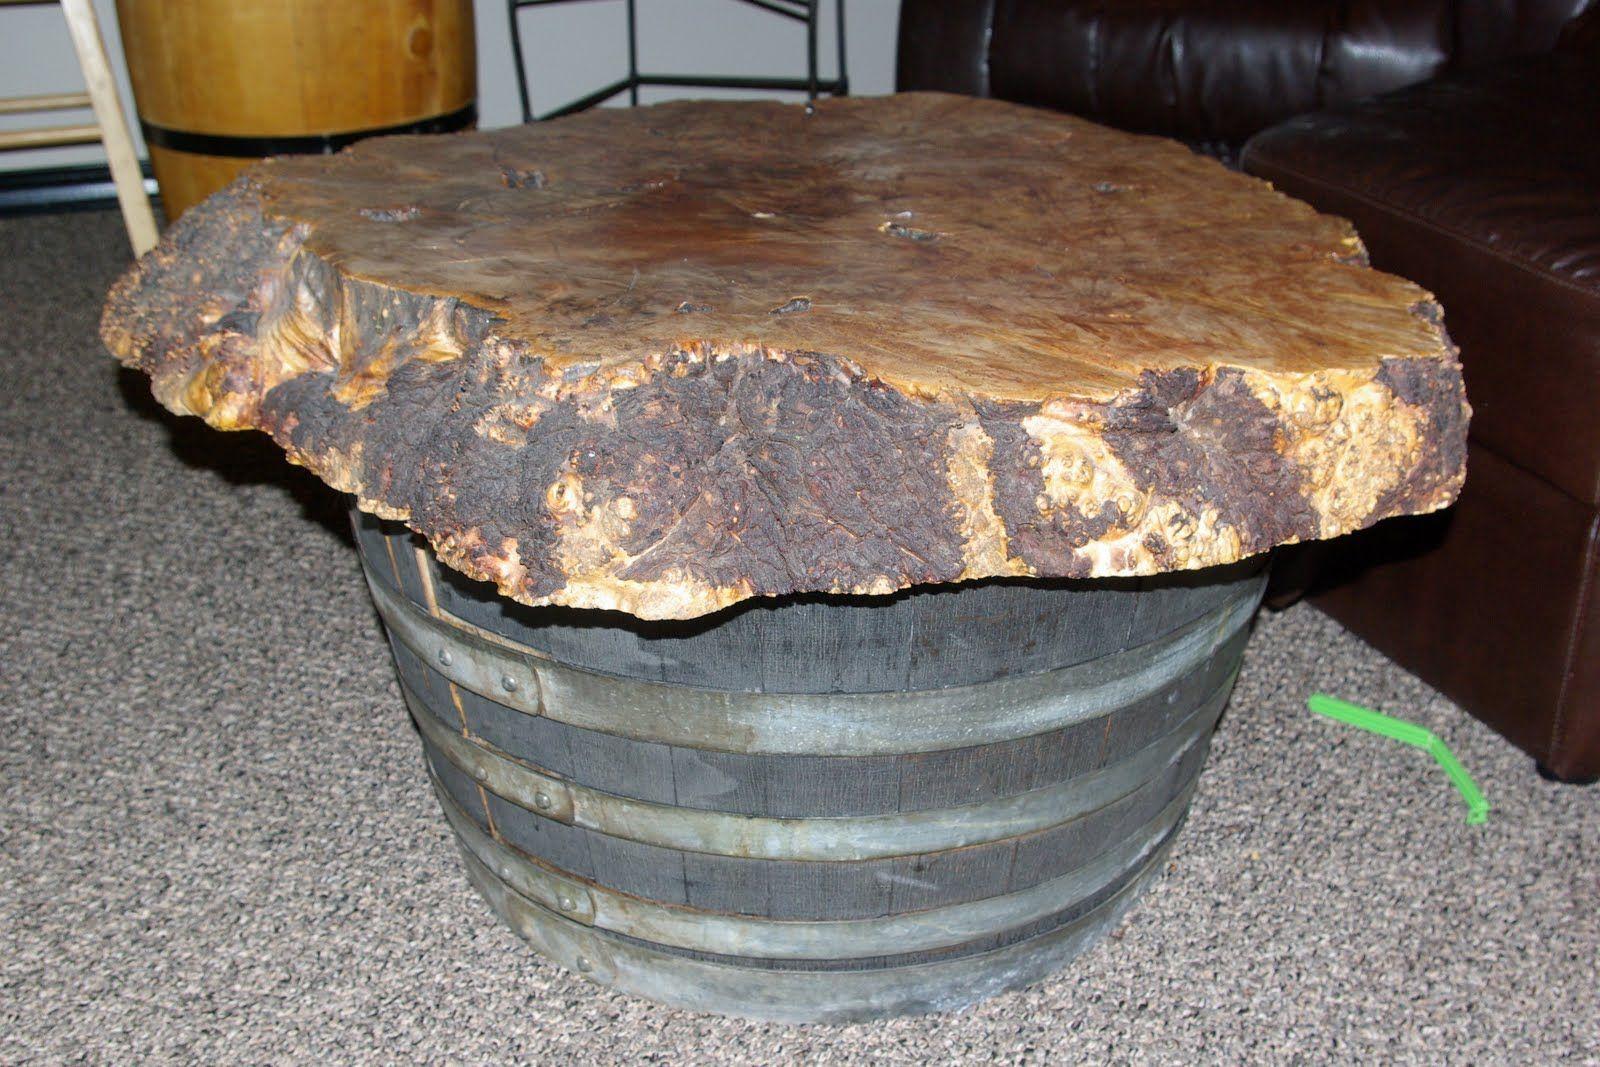 Reclaimed Rustics Wine Barrel Coffee Table Wine Barrel Coffee Table Barrel Coffee Table Coffee Table [ 1067 x 1600 Pixel ]